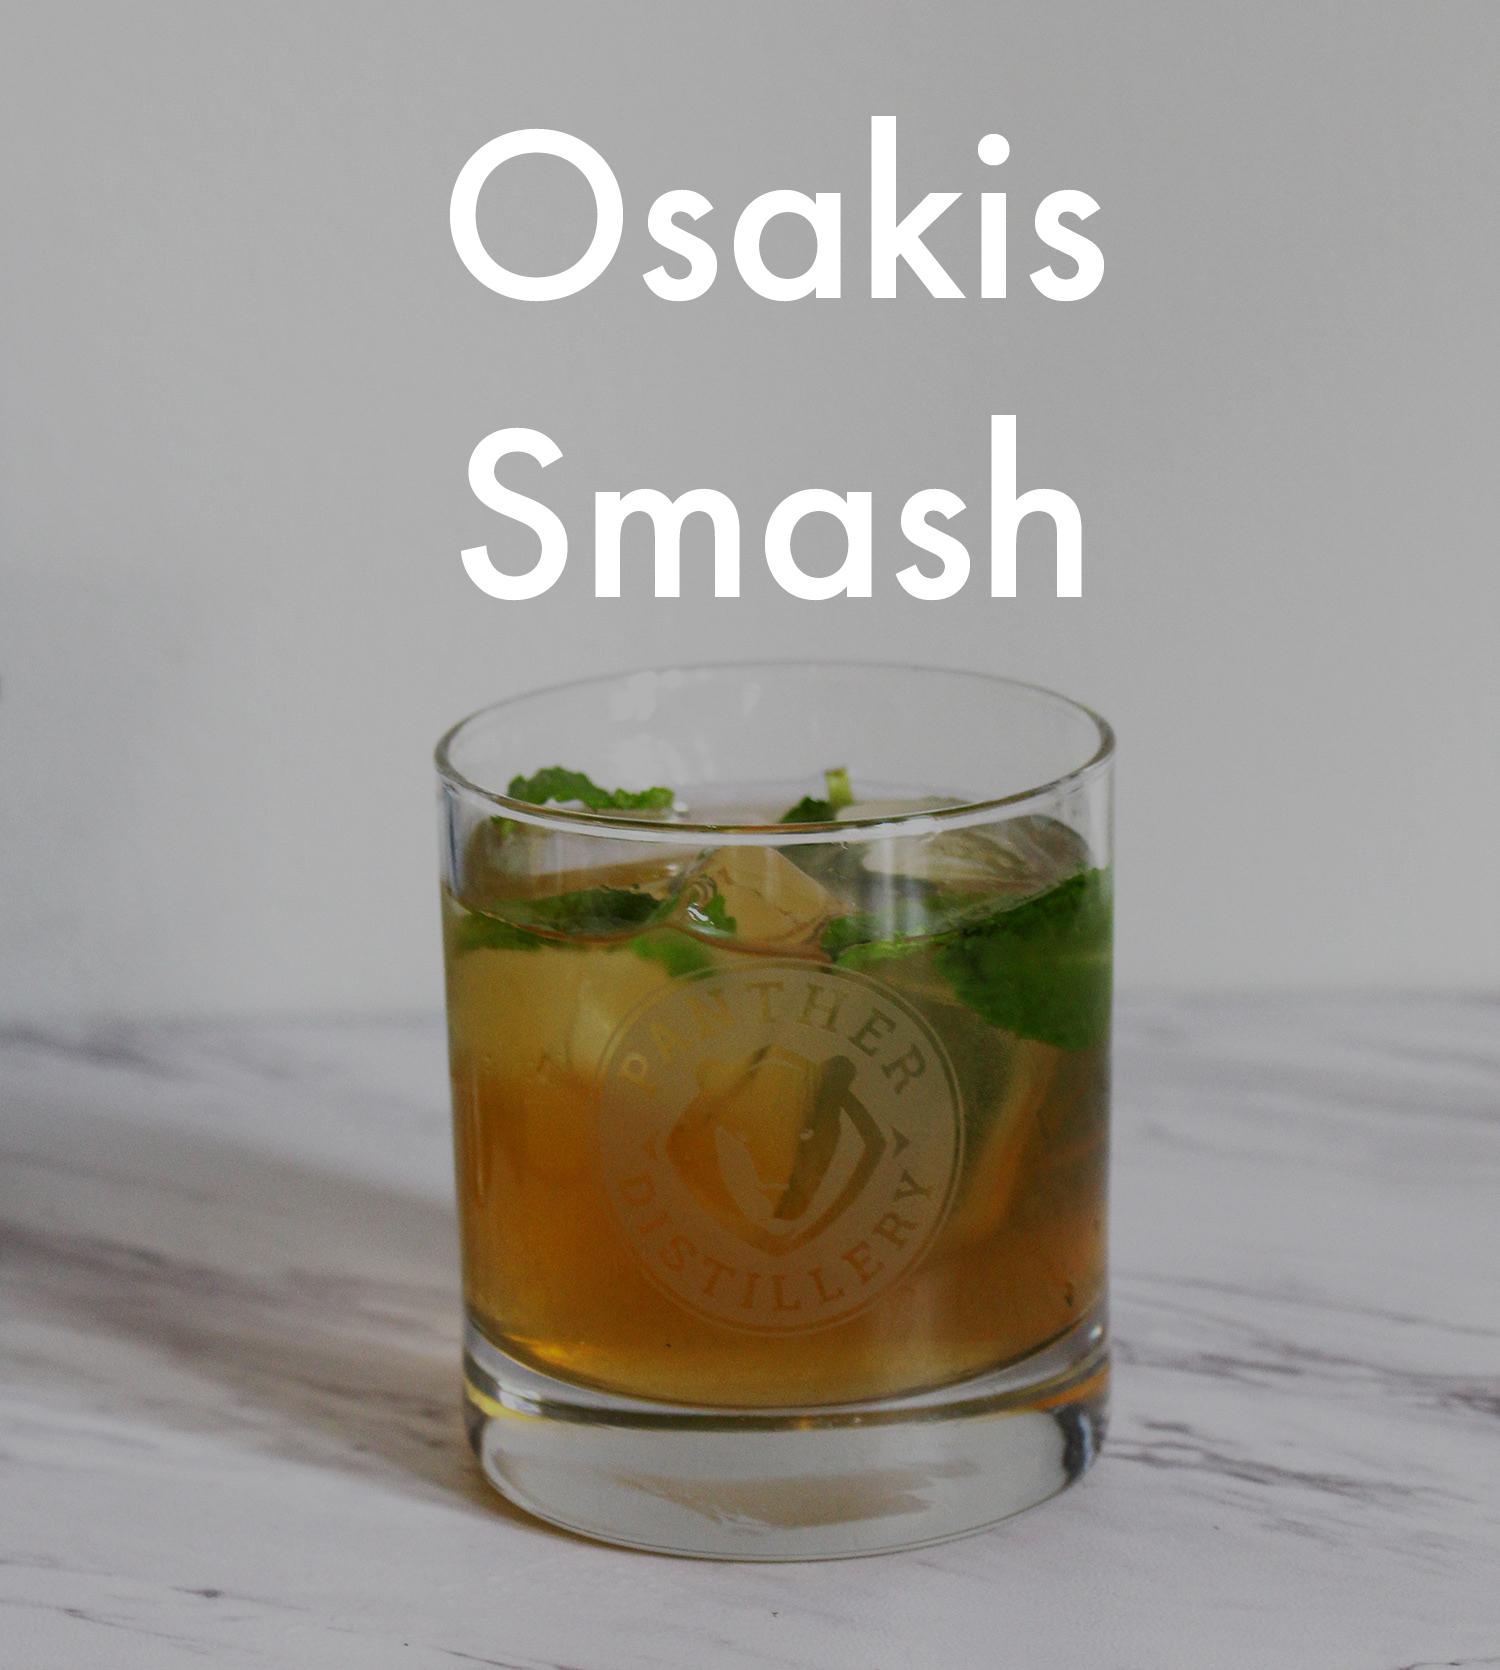 Osakis_Smash.jpg